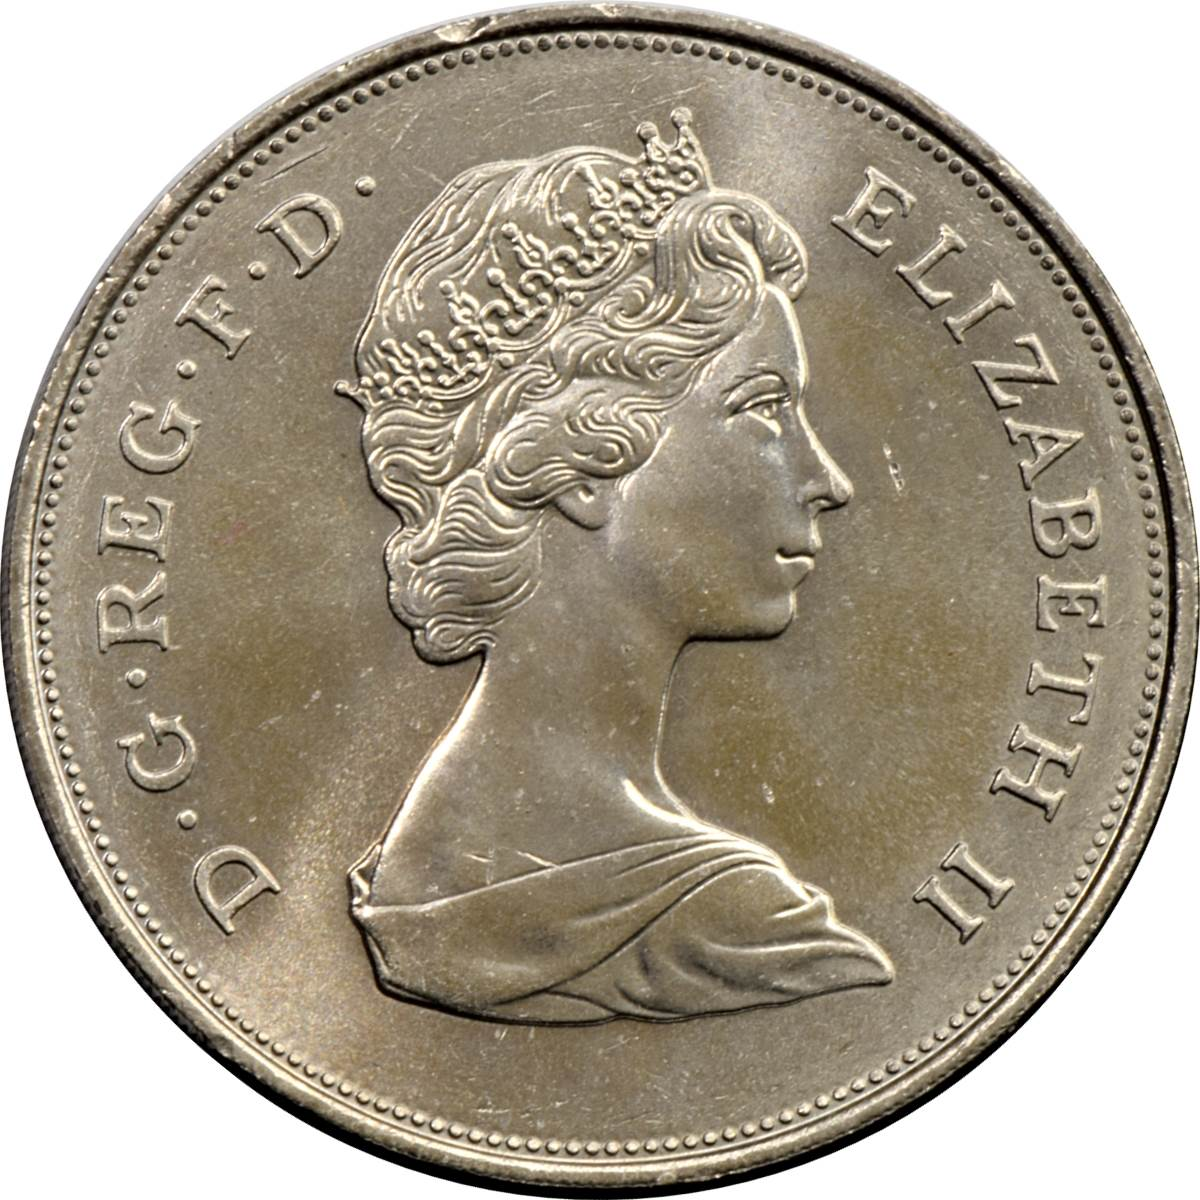 United Kingdom Queen Elizabeth II 1975 2 New Pence Gold